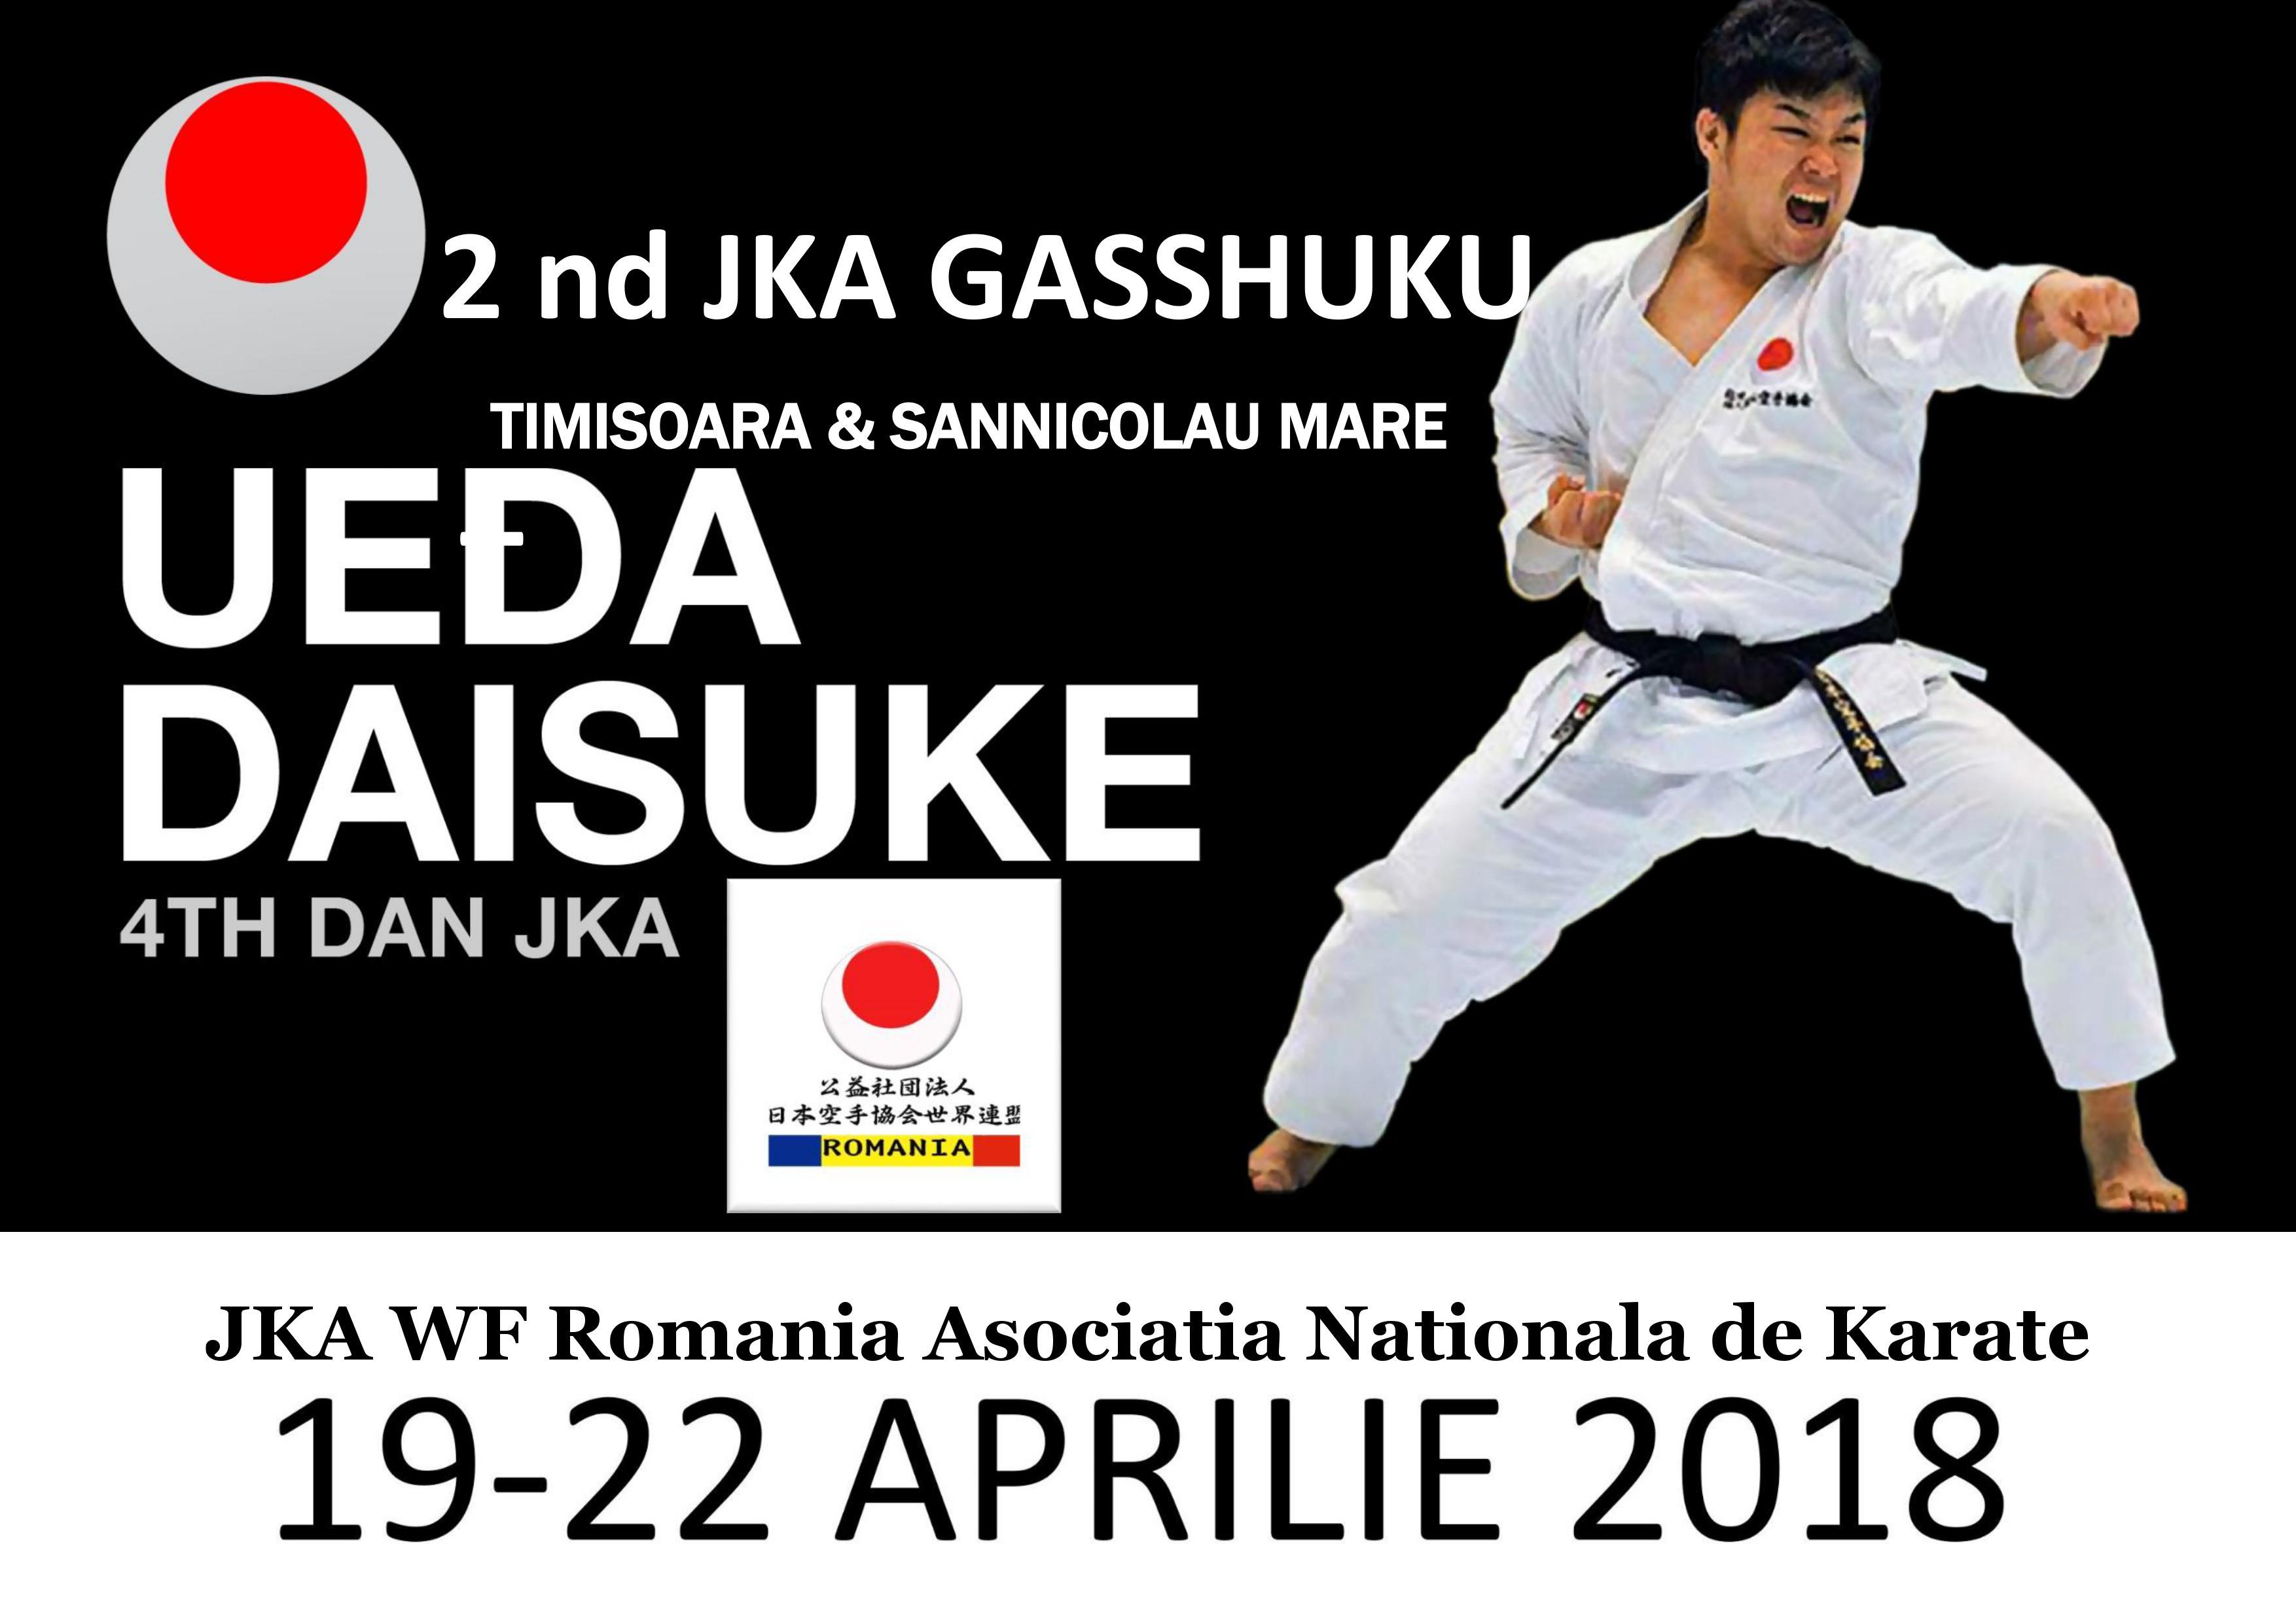 2 nd JKA GASSHUKU 2018-Ueda Daisuke Sensei-Timisoara&Sannicolau Mare